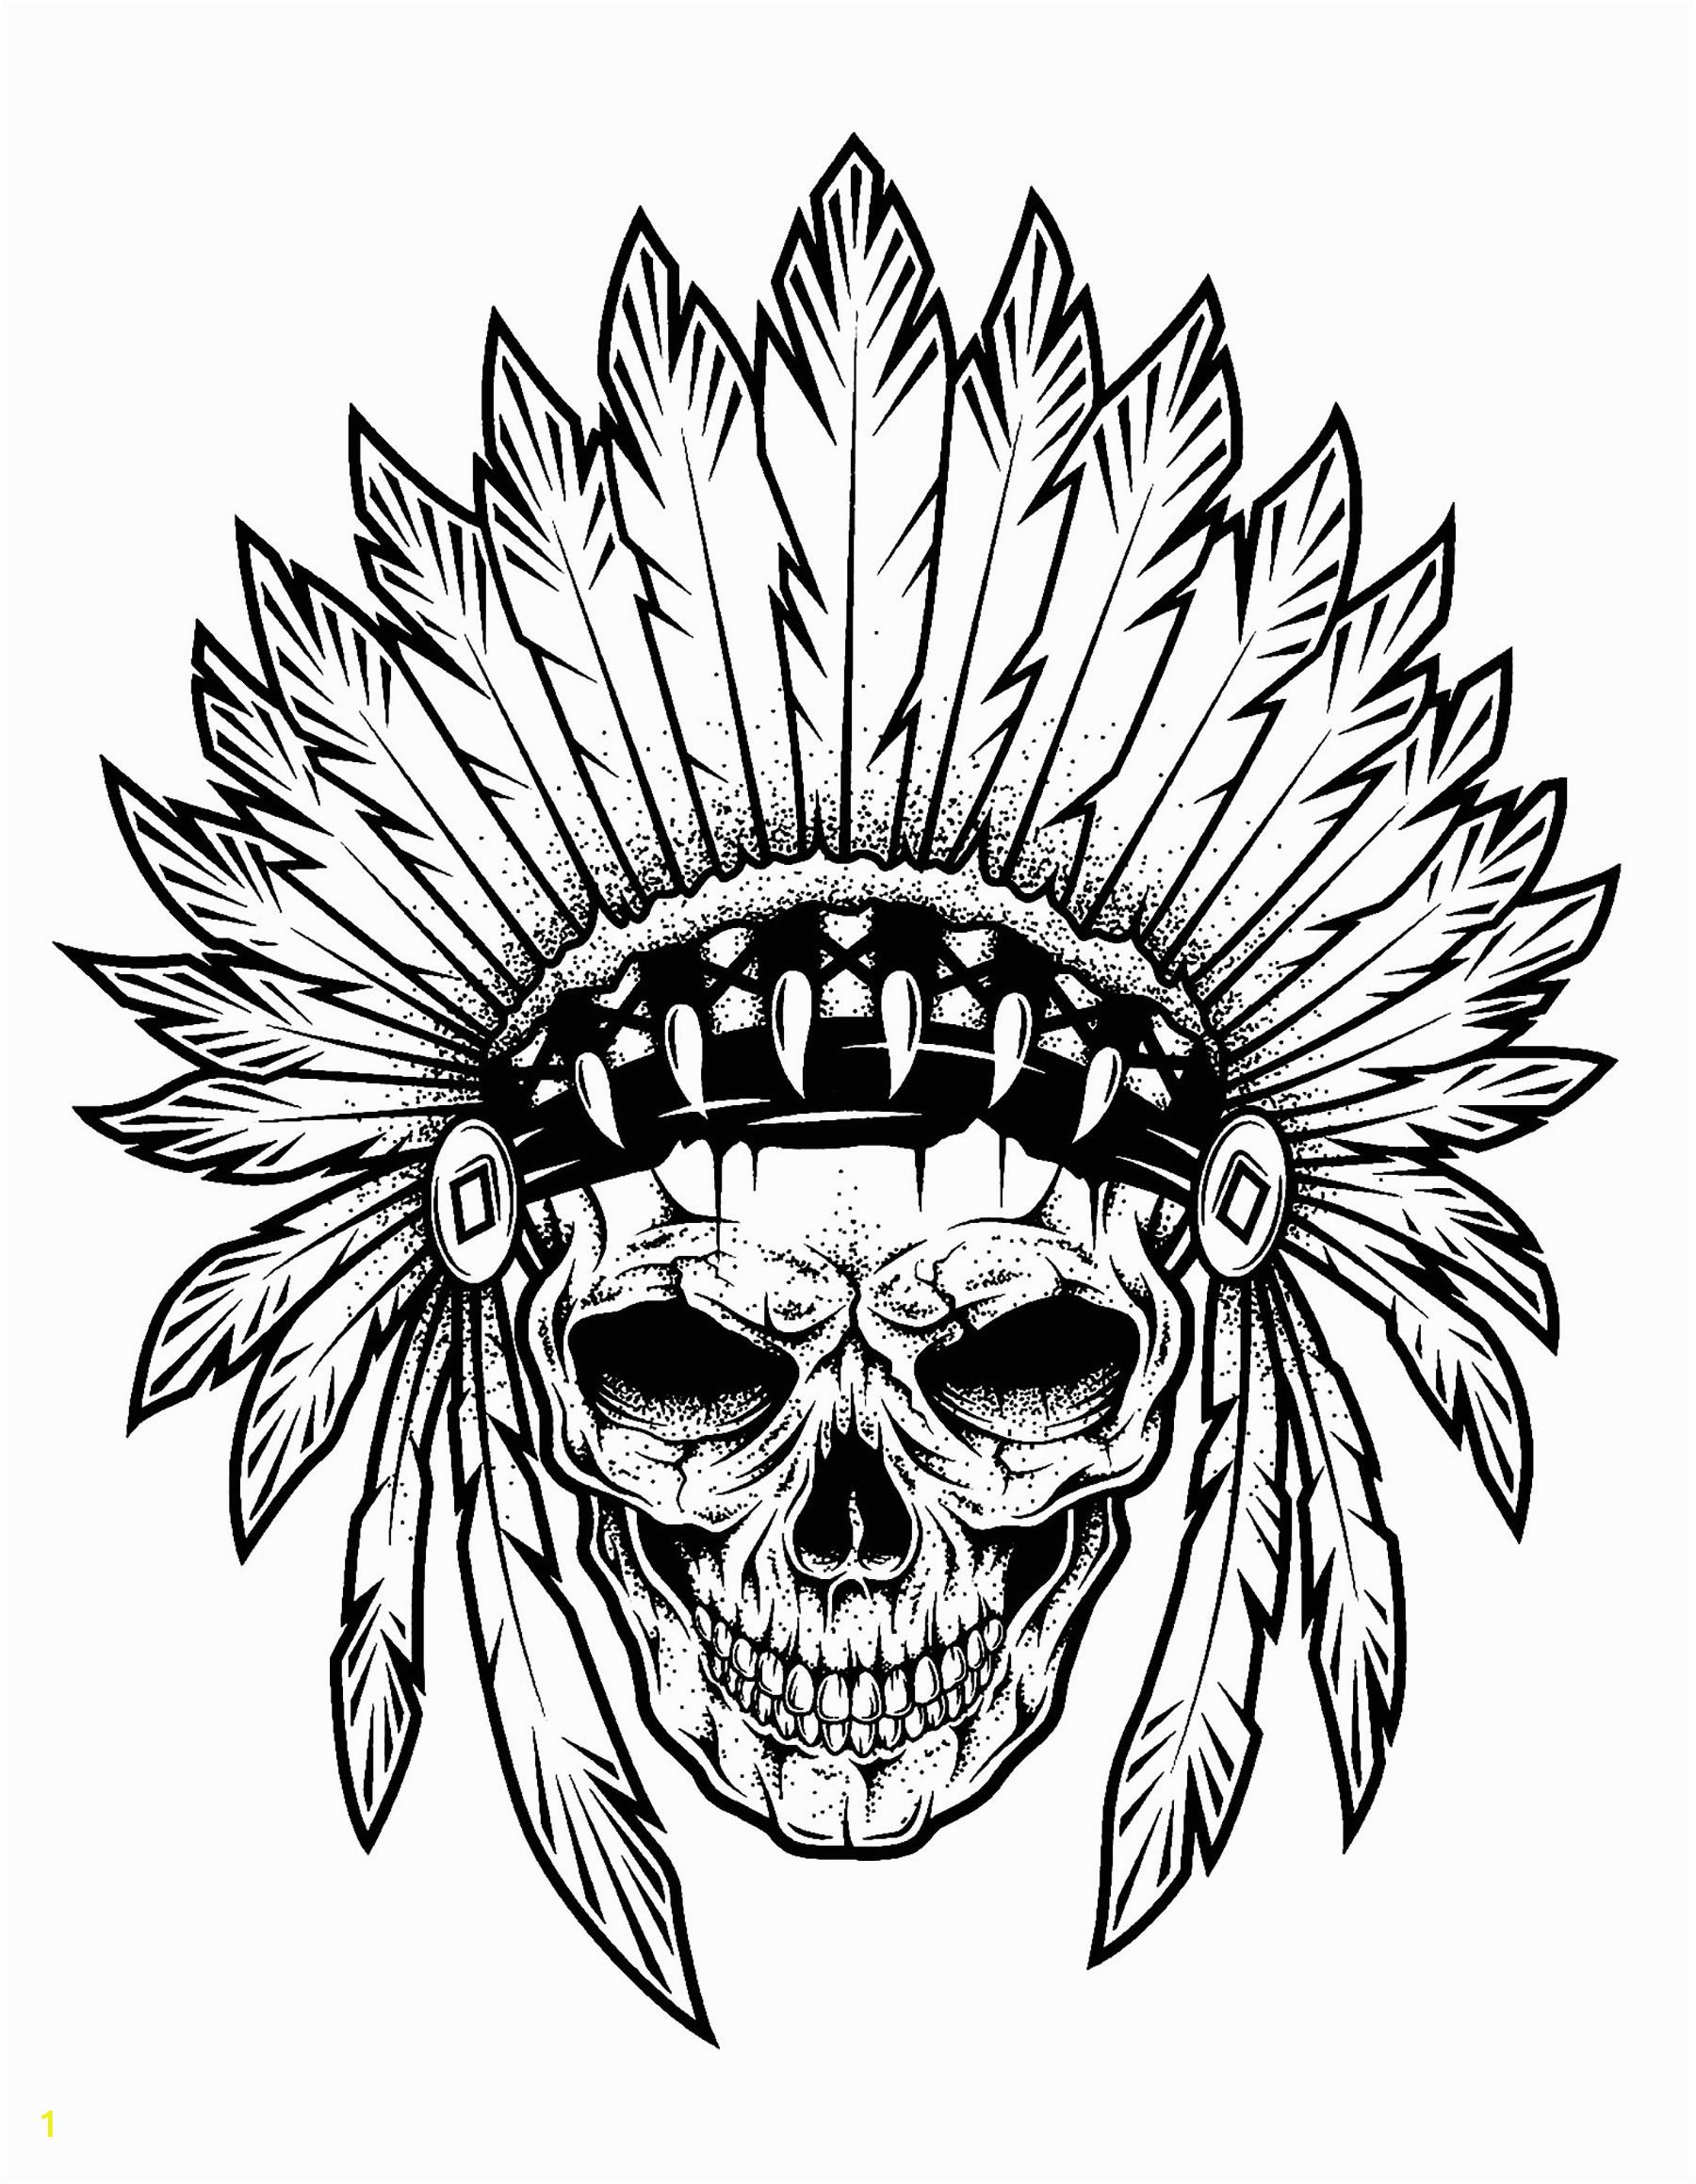 image=tatoo coloring tattoo indian chief skull 1